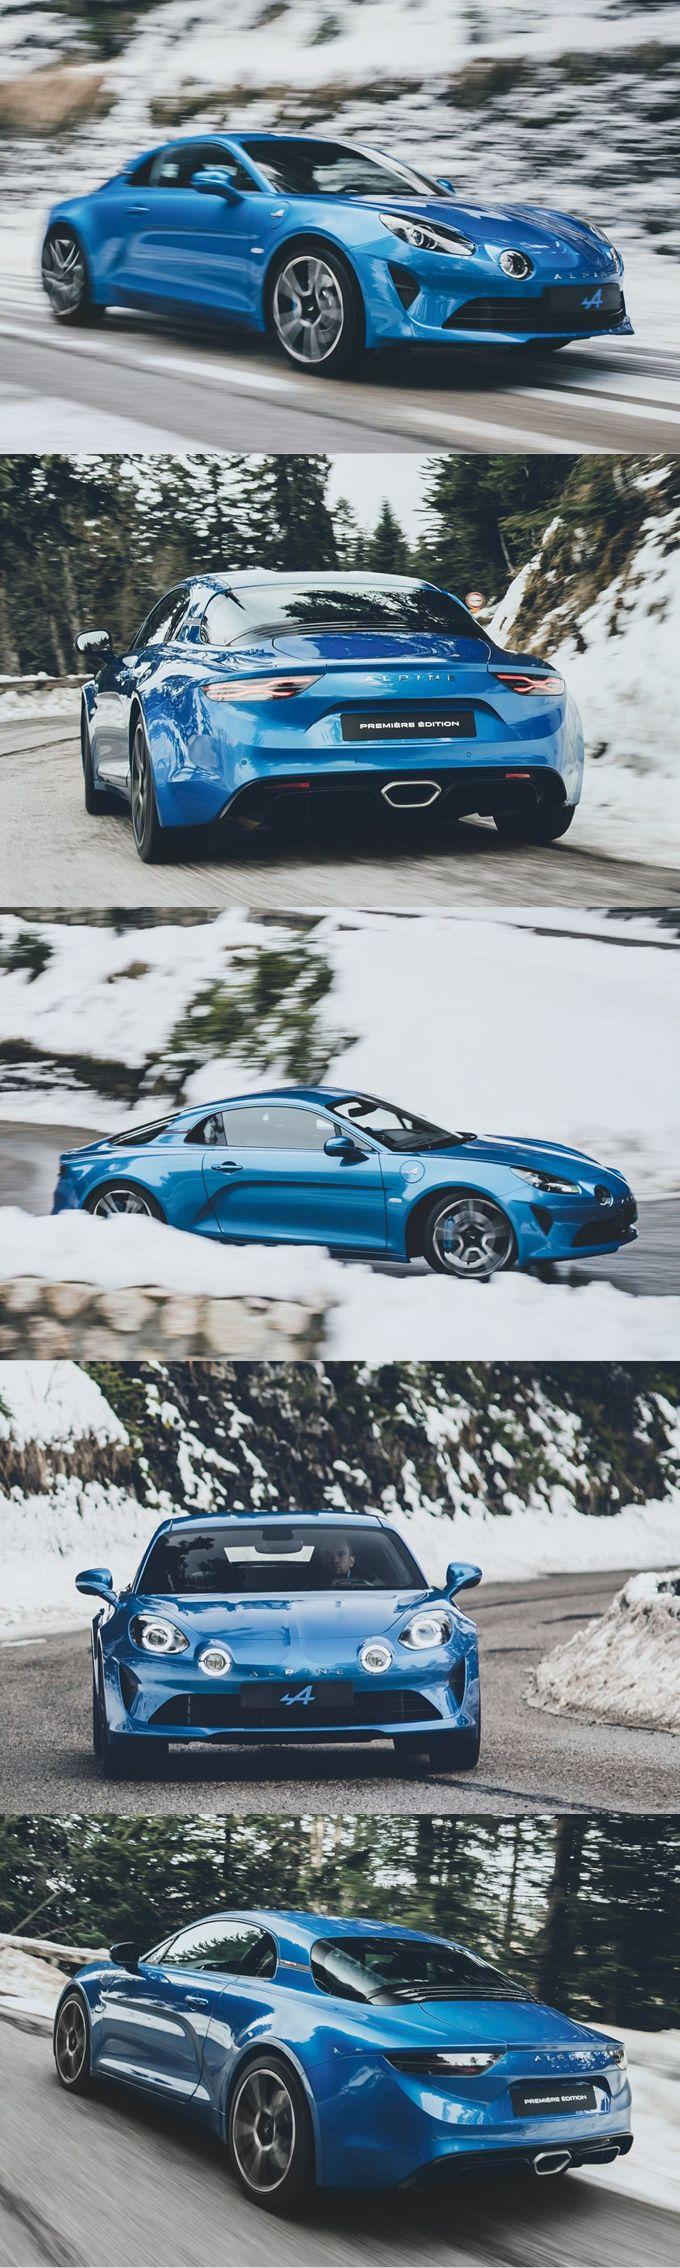 2017 Alpine A110 / 252hp / France / blue / 17-387 Instagram: @iamroboneill Twitter: @iamroboneill Visit http://iamroboneill.com/